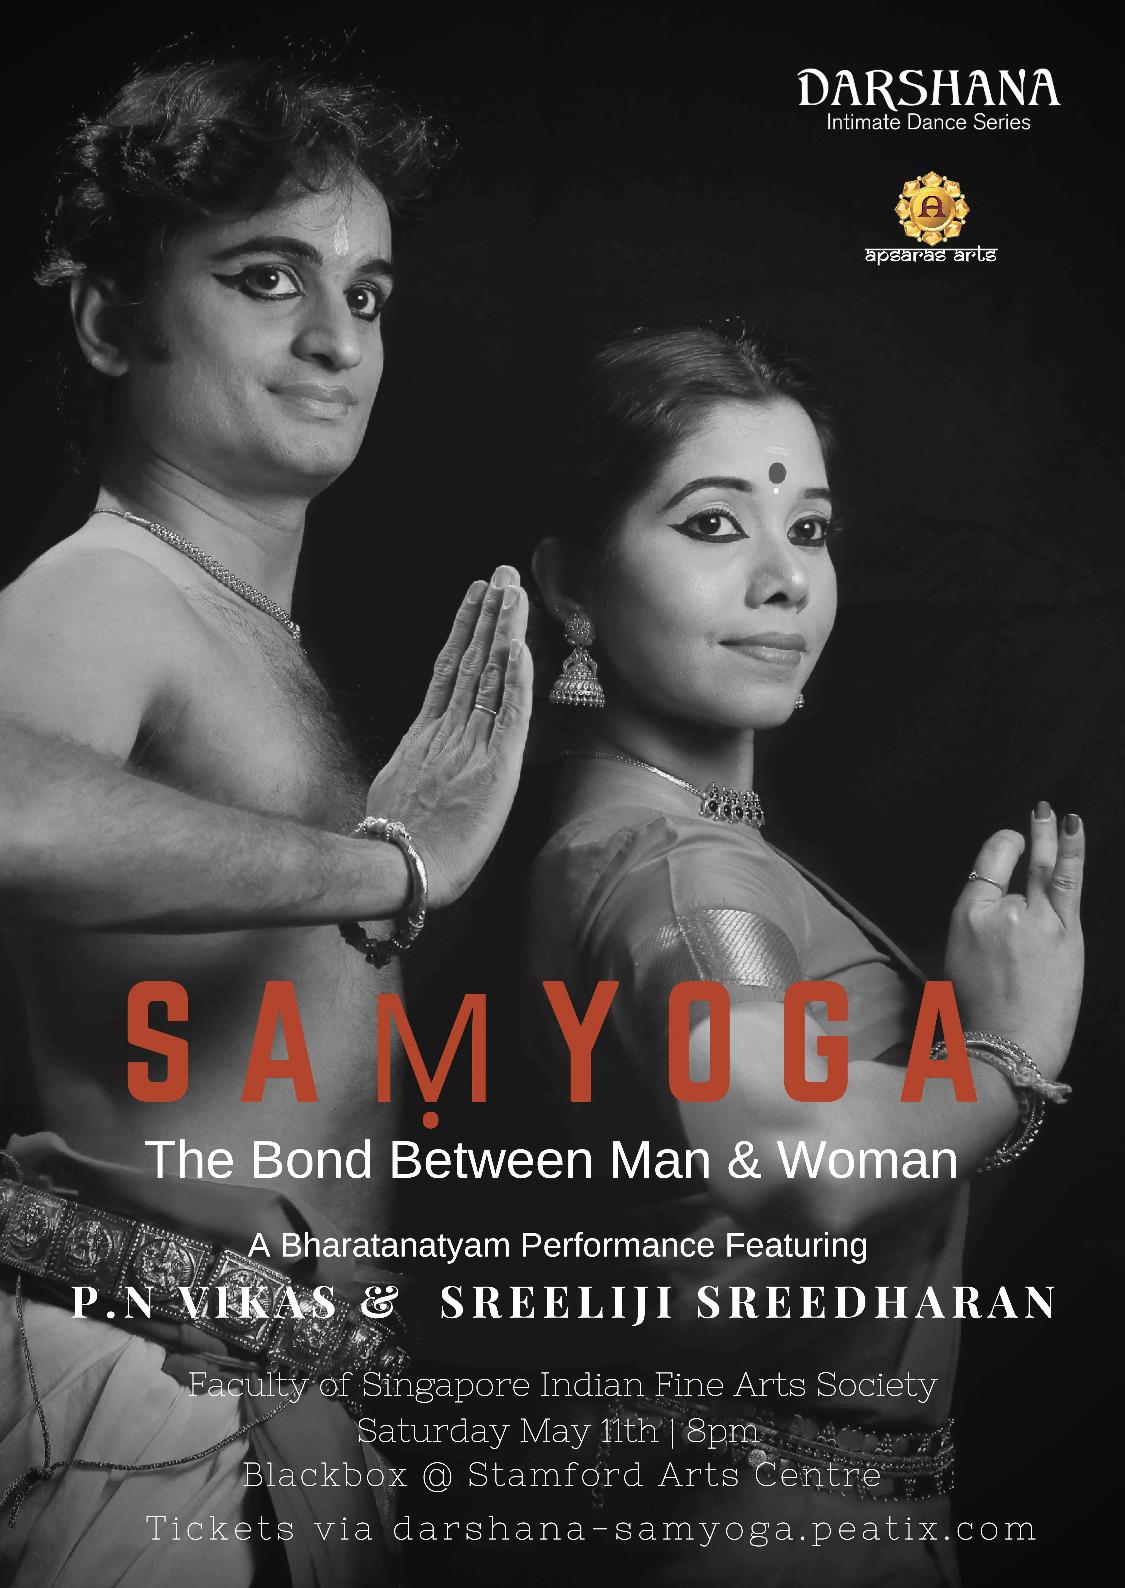 Samyoga – The Bond Between Man & Woman